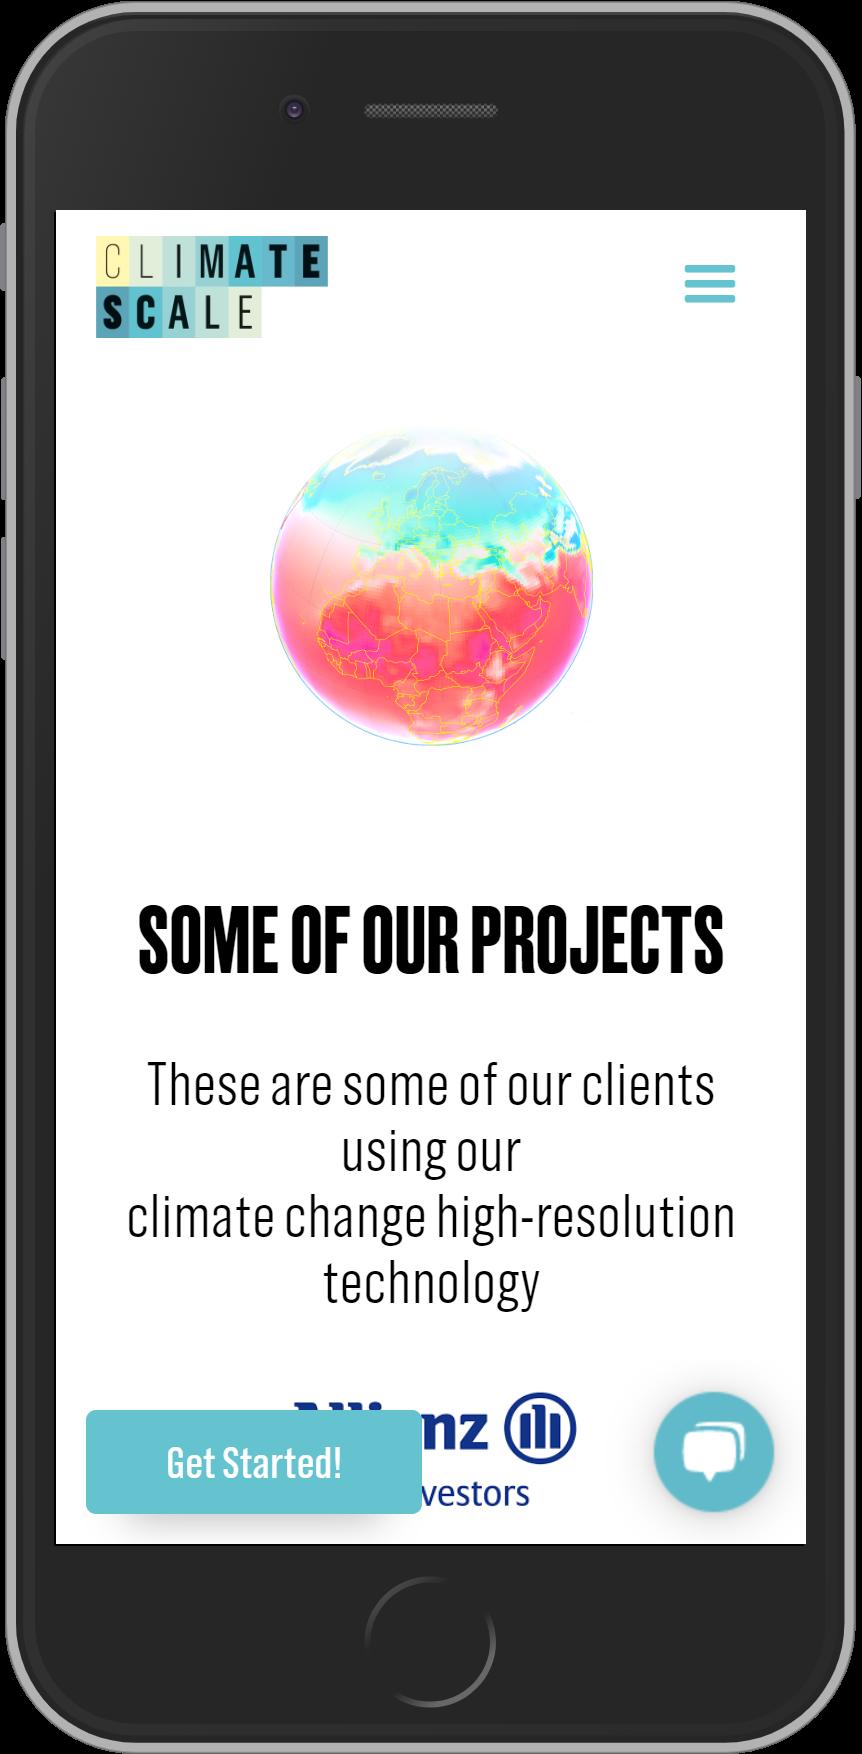 Mobile responsive landing page website built on Webflow